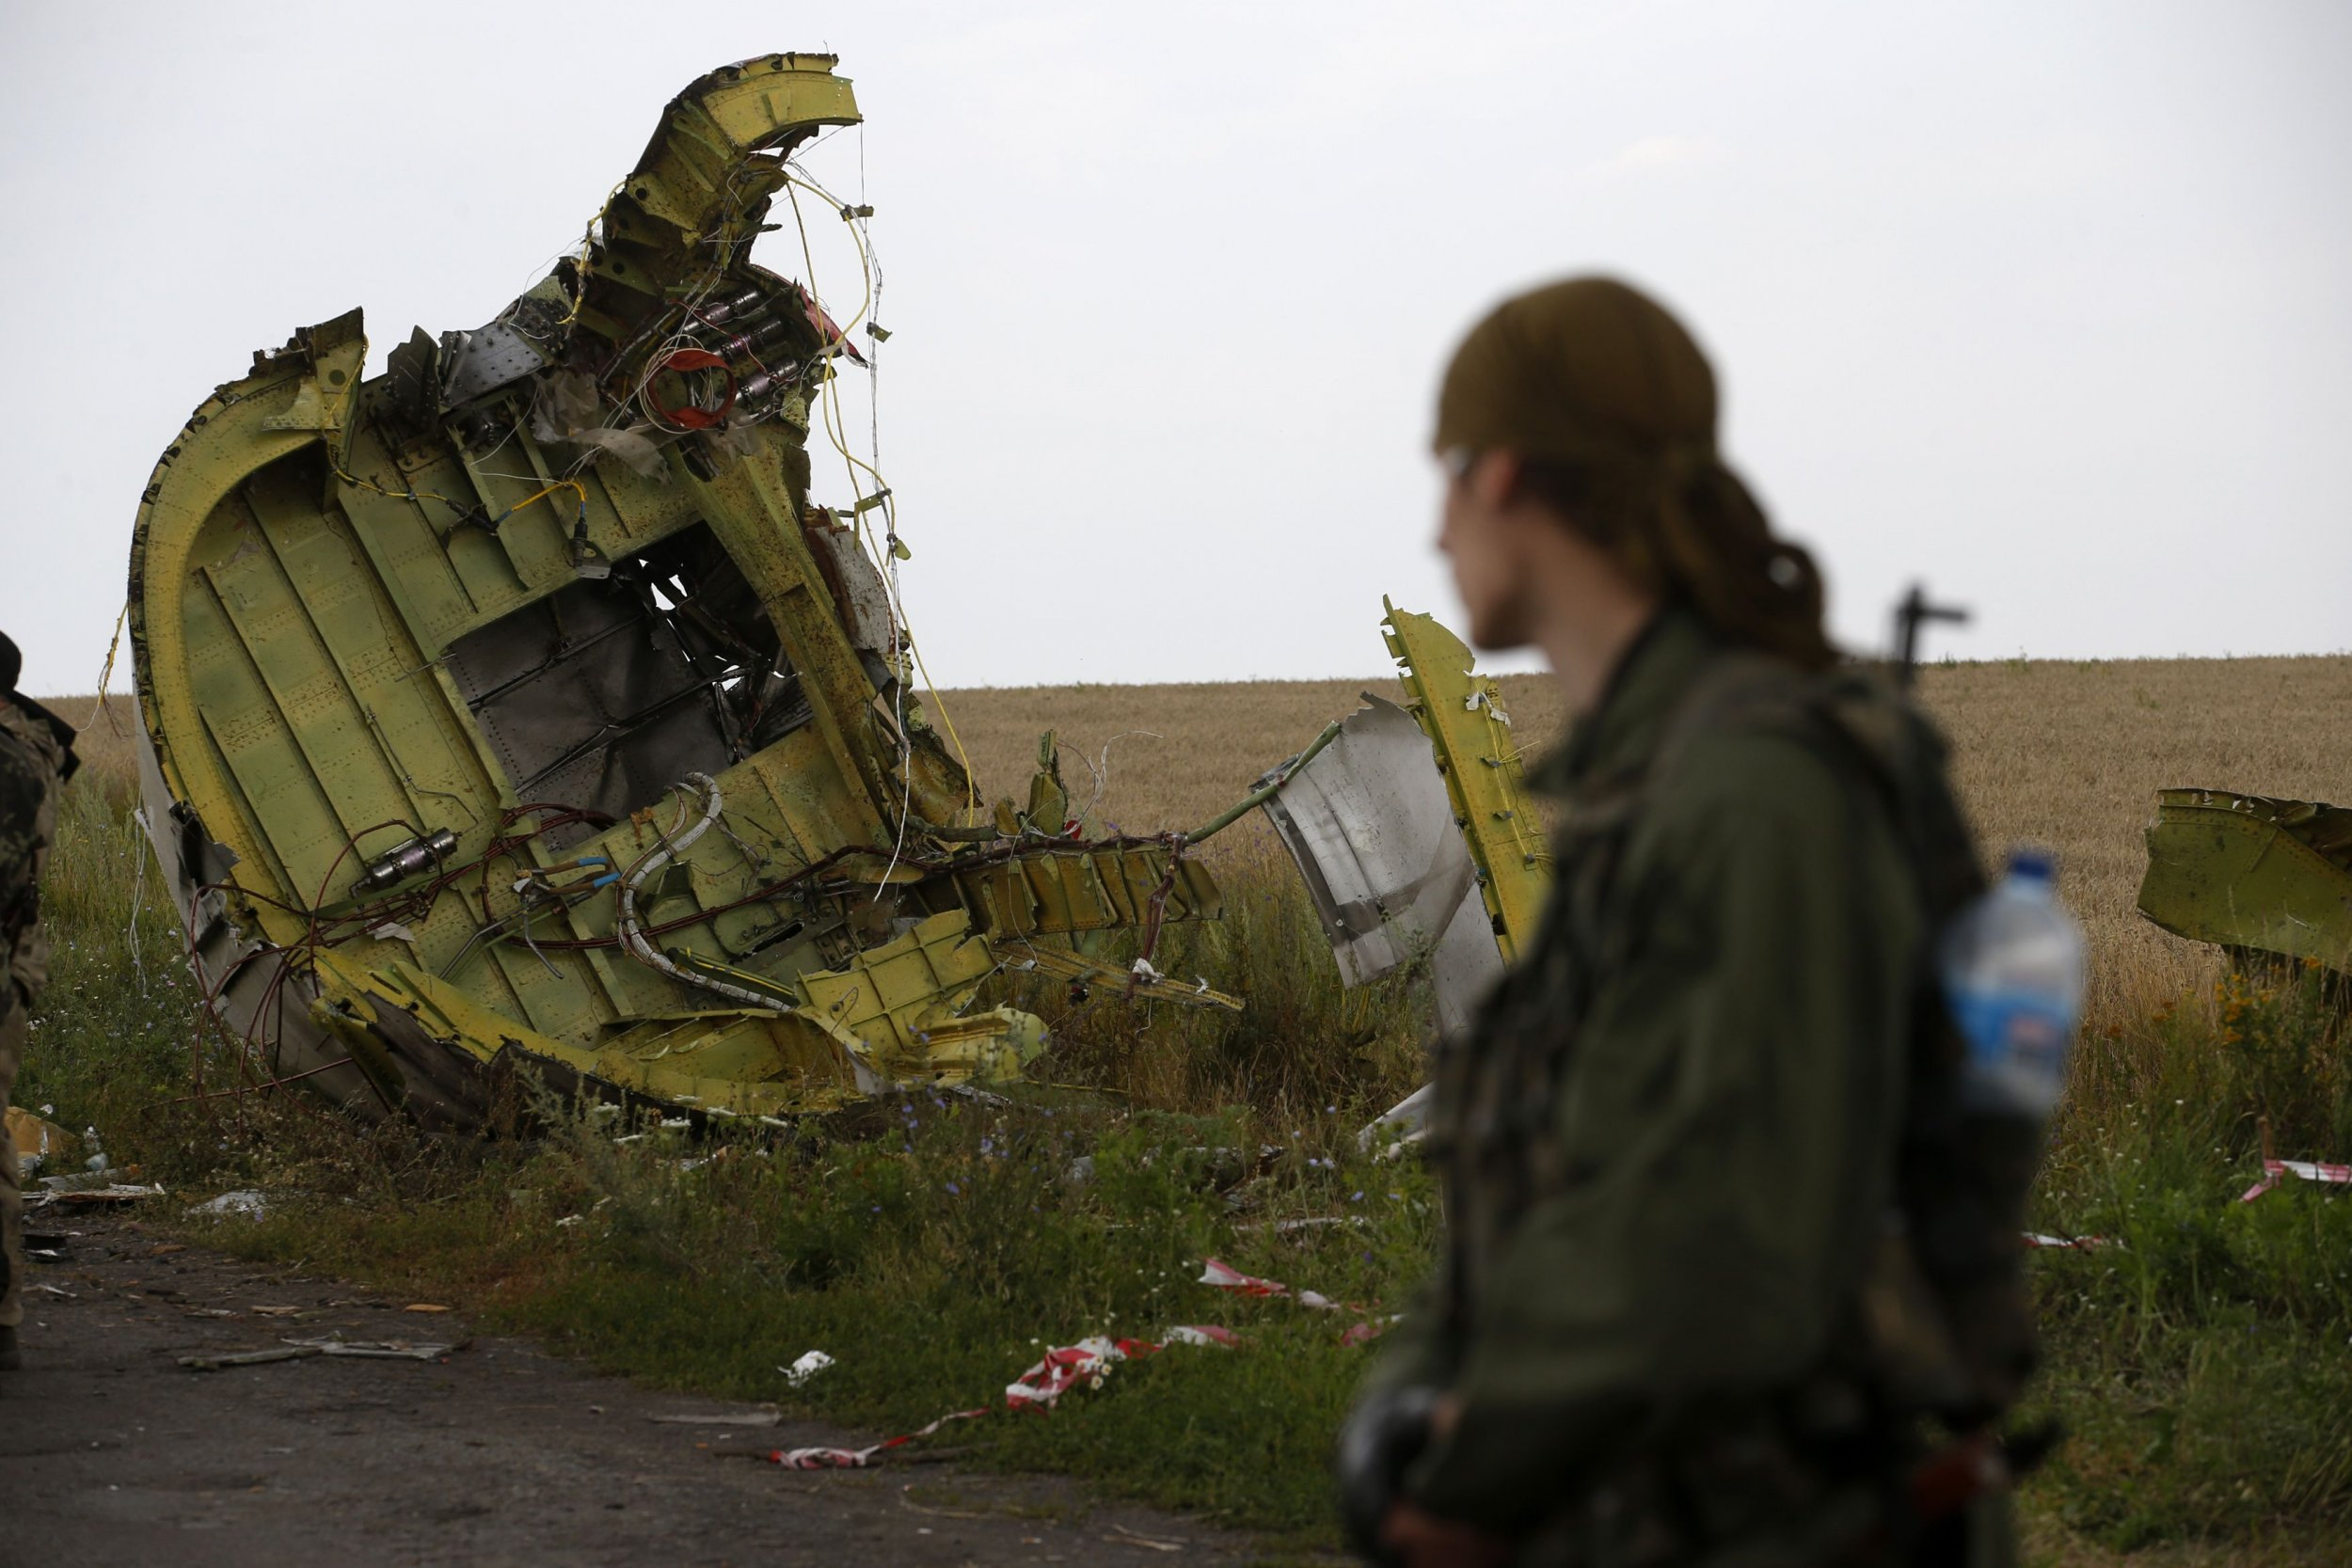 2014-07-22T141249Z_230697516_GM1EA7M1PKS01_RTRMADP_3_UKRAINE-CRISIS